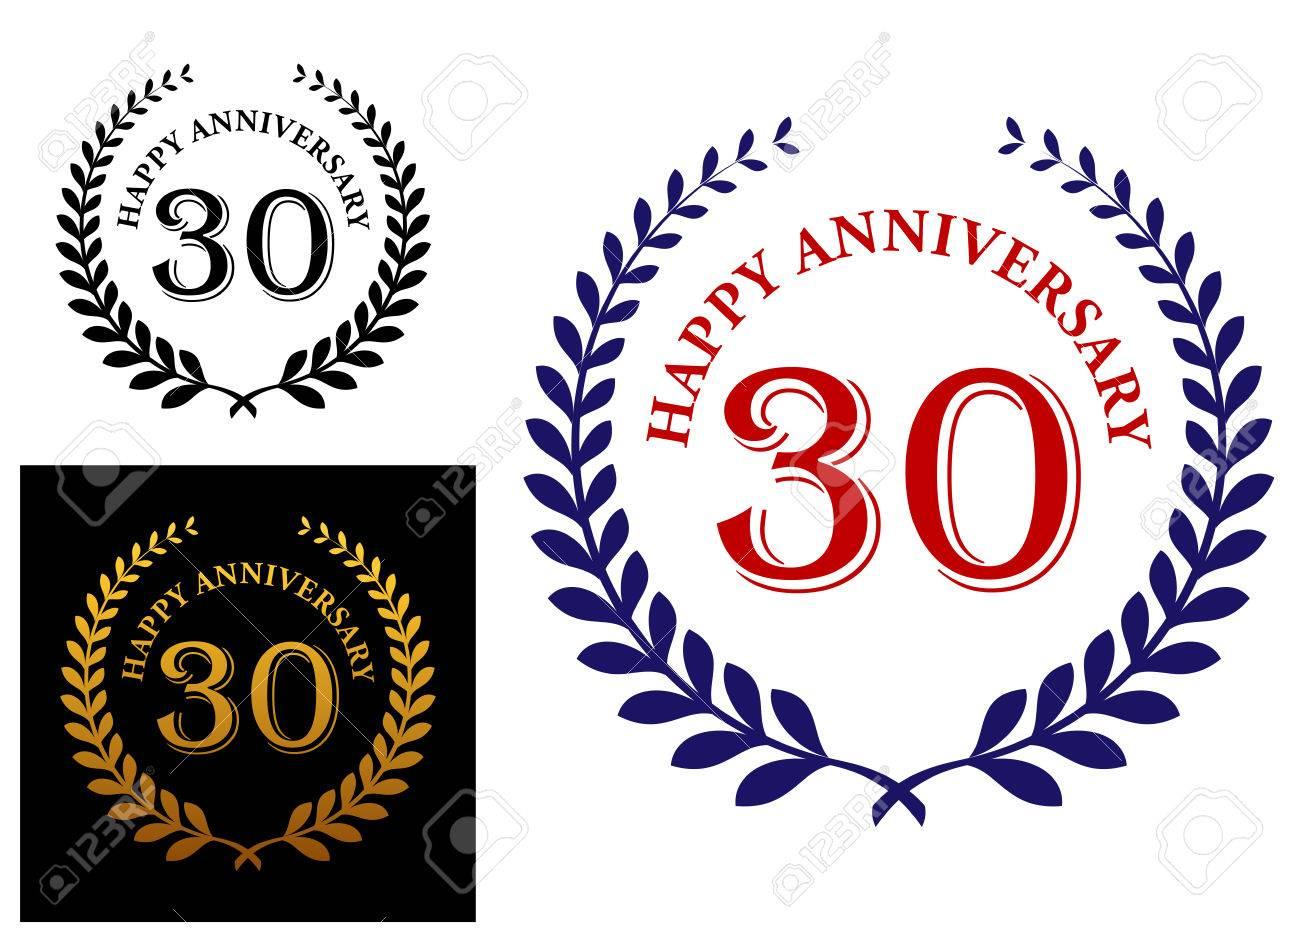 Happy 30th anniversary emblem with a foliate laurel wreath enclosing...